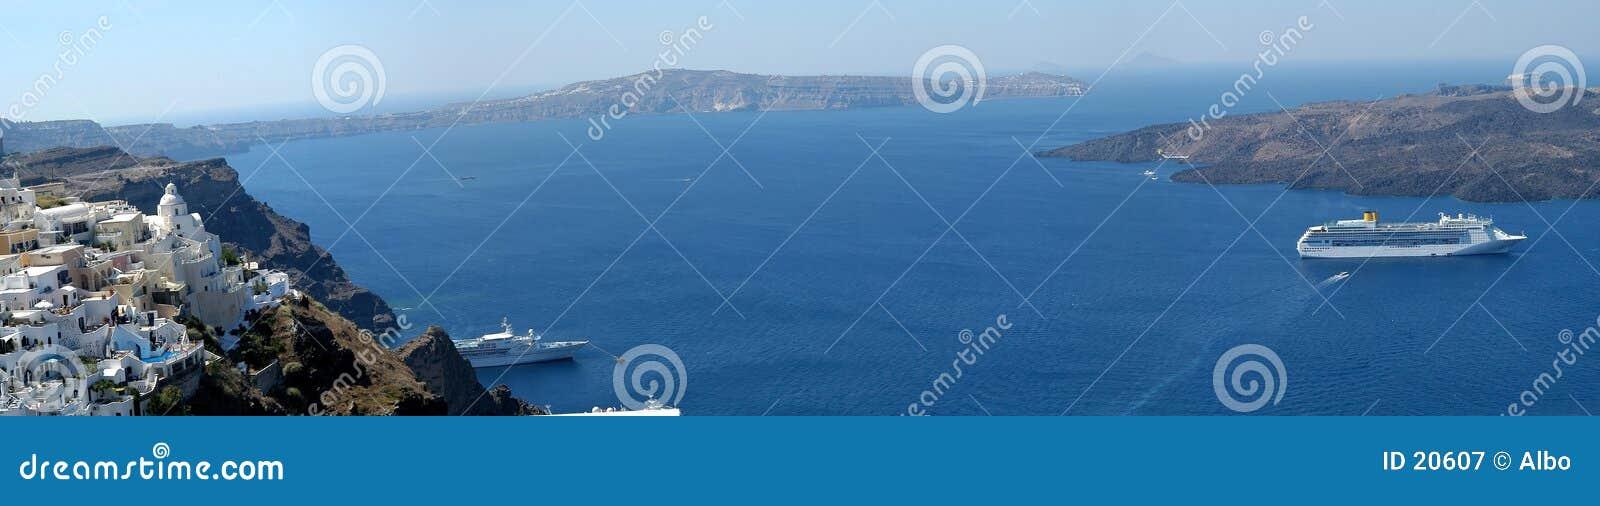 Panorama de Santorini